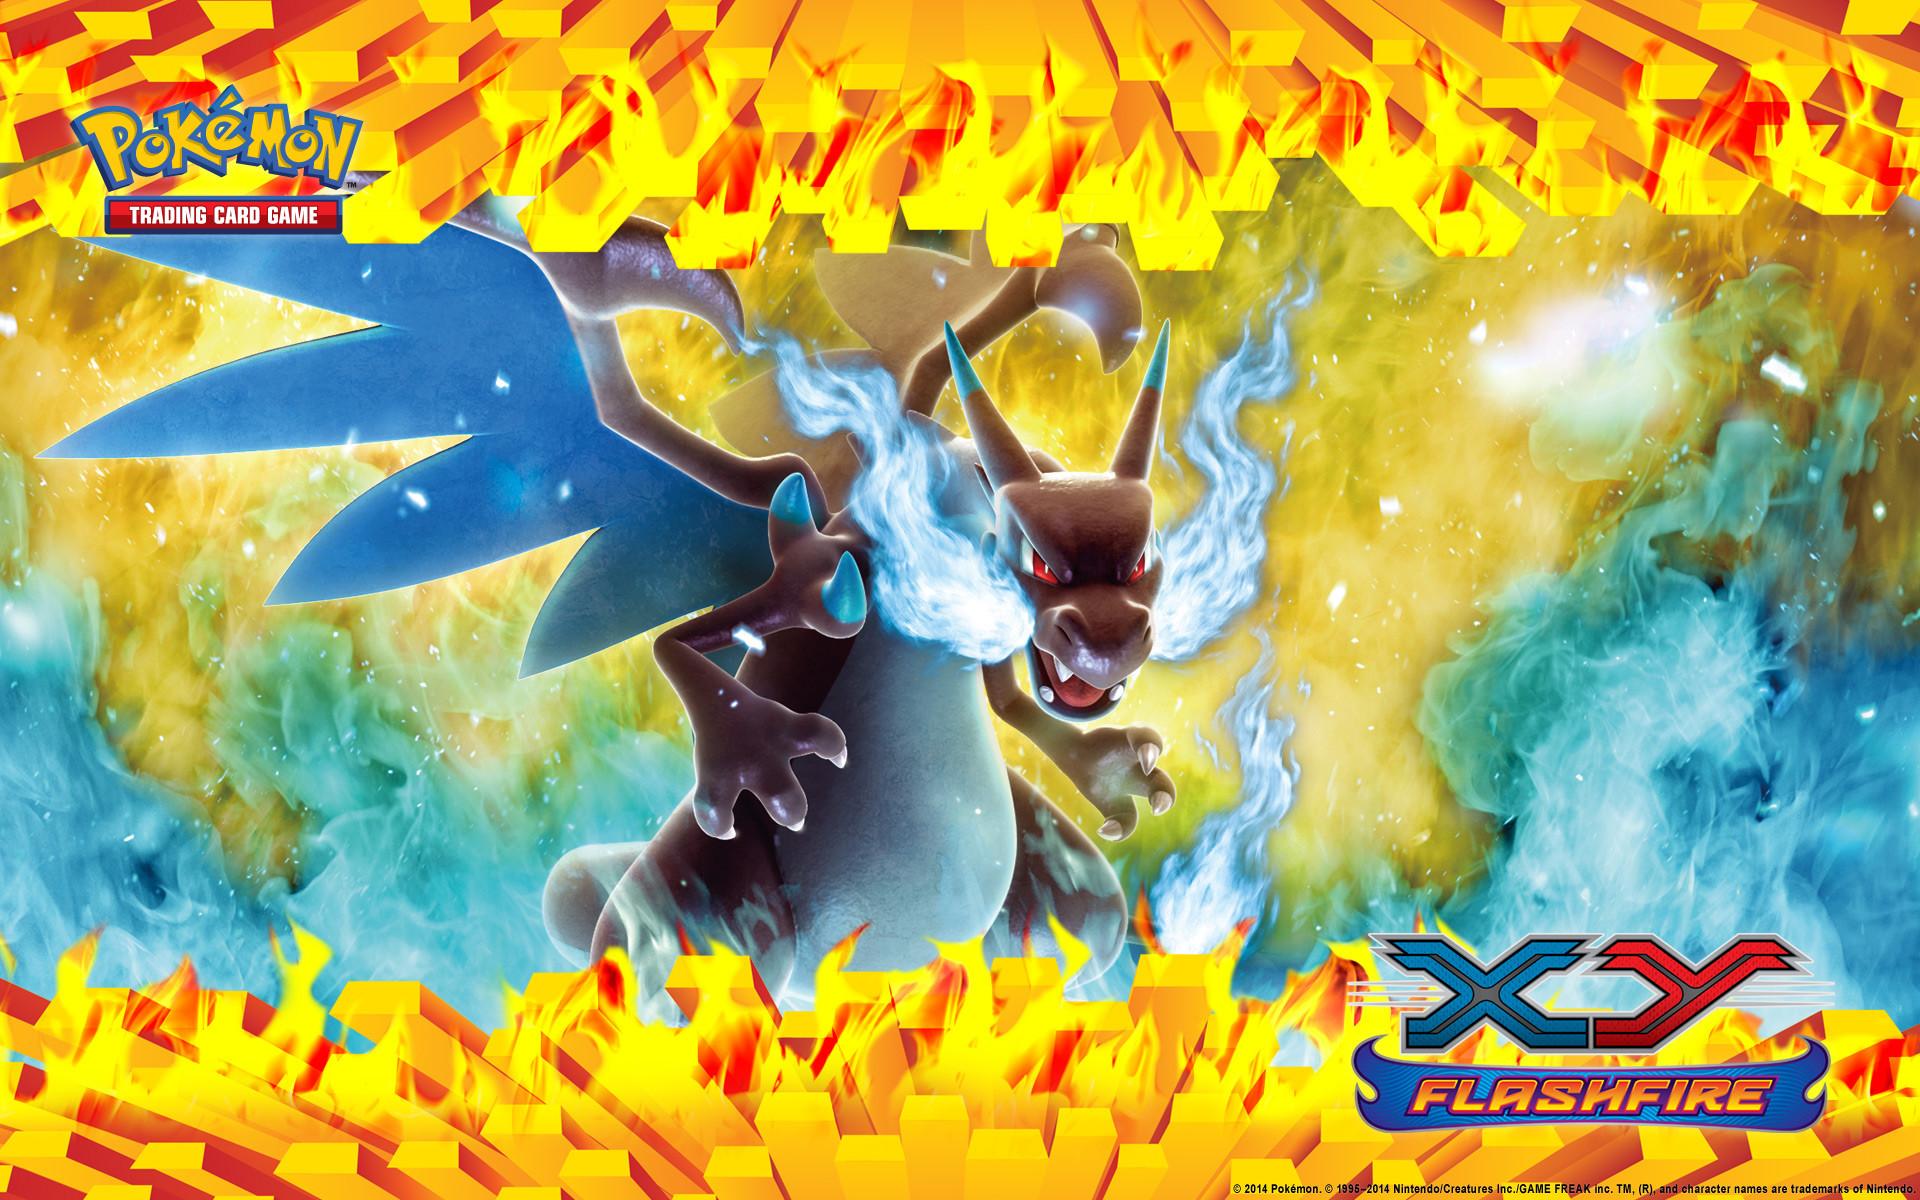 xy02-wallpaper-mega-charizard-1920.jpg 1,920×1,200 pixels | pokemon |  Pinterest | Pokémon